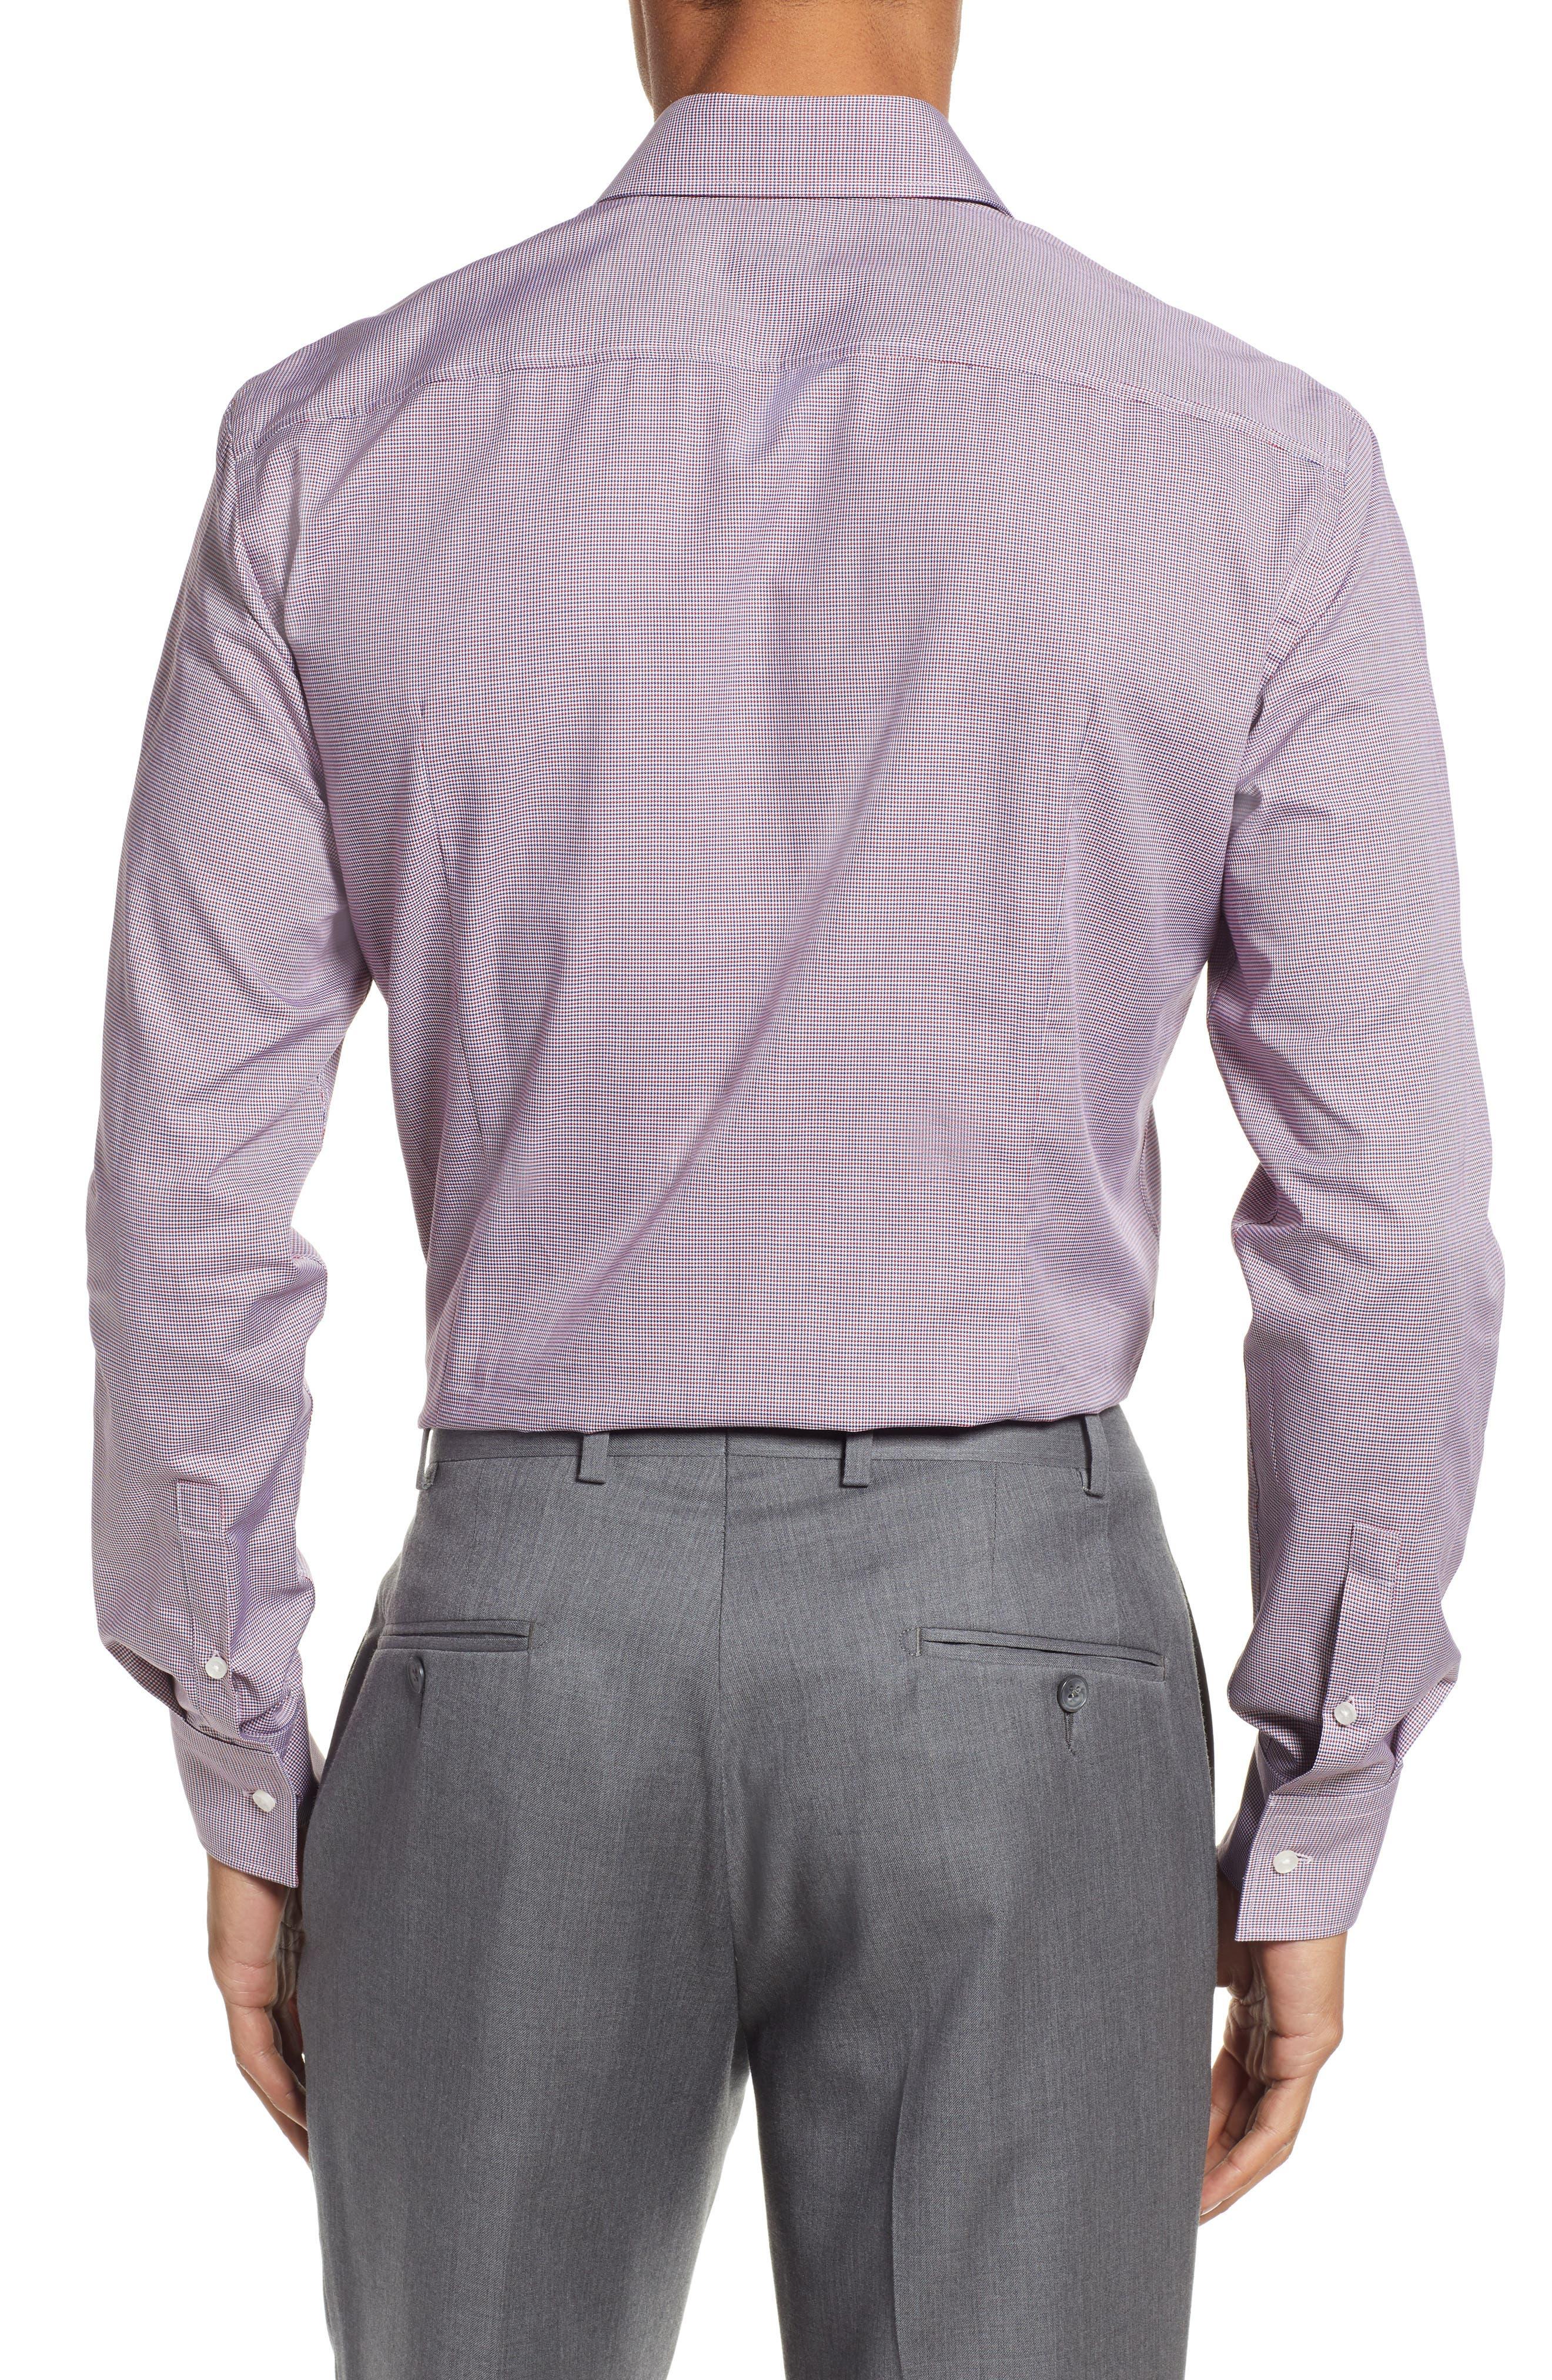 Jason Slim Fit Houndstooth Dress Shirt,                             Alternate thumbnail 3, color,                             RED